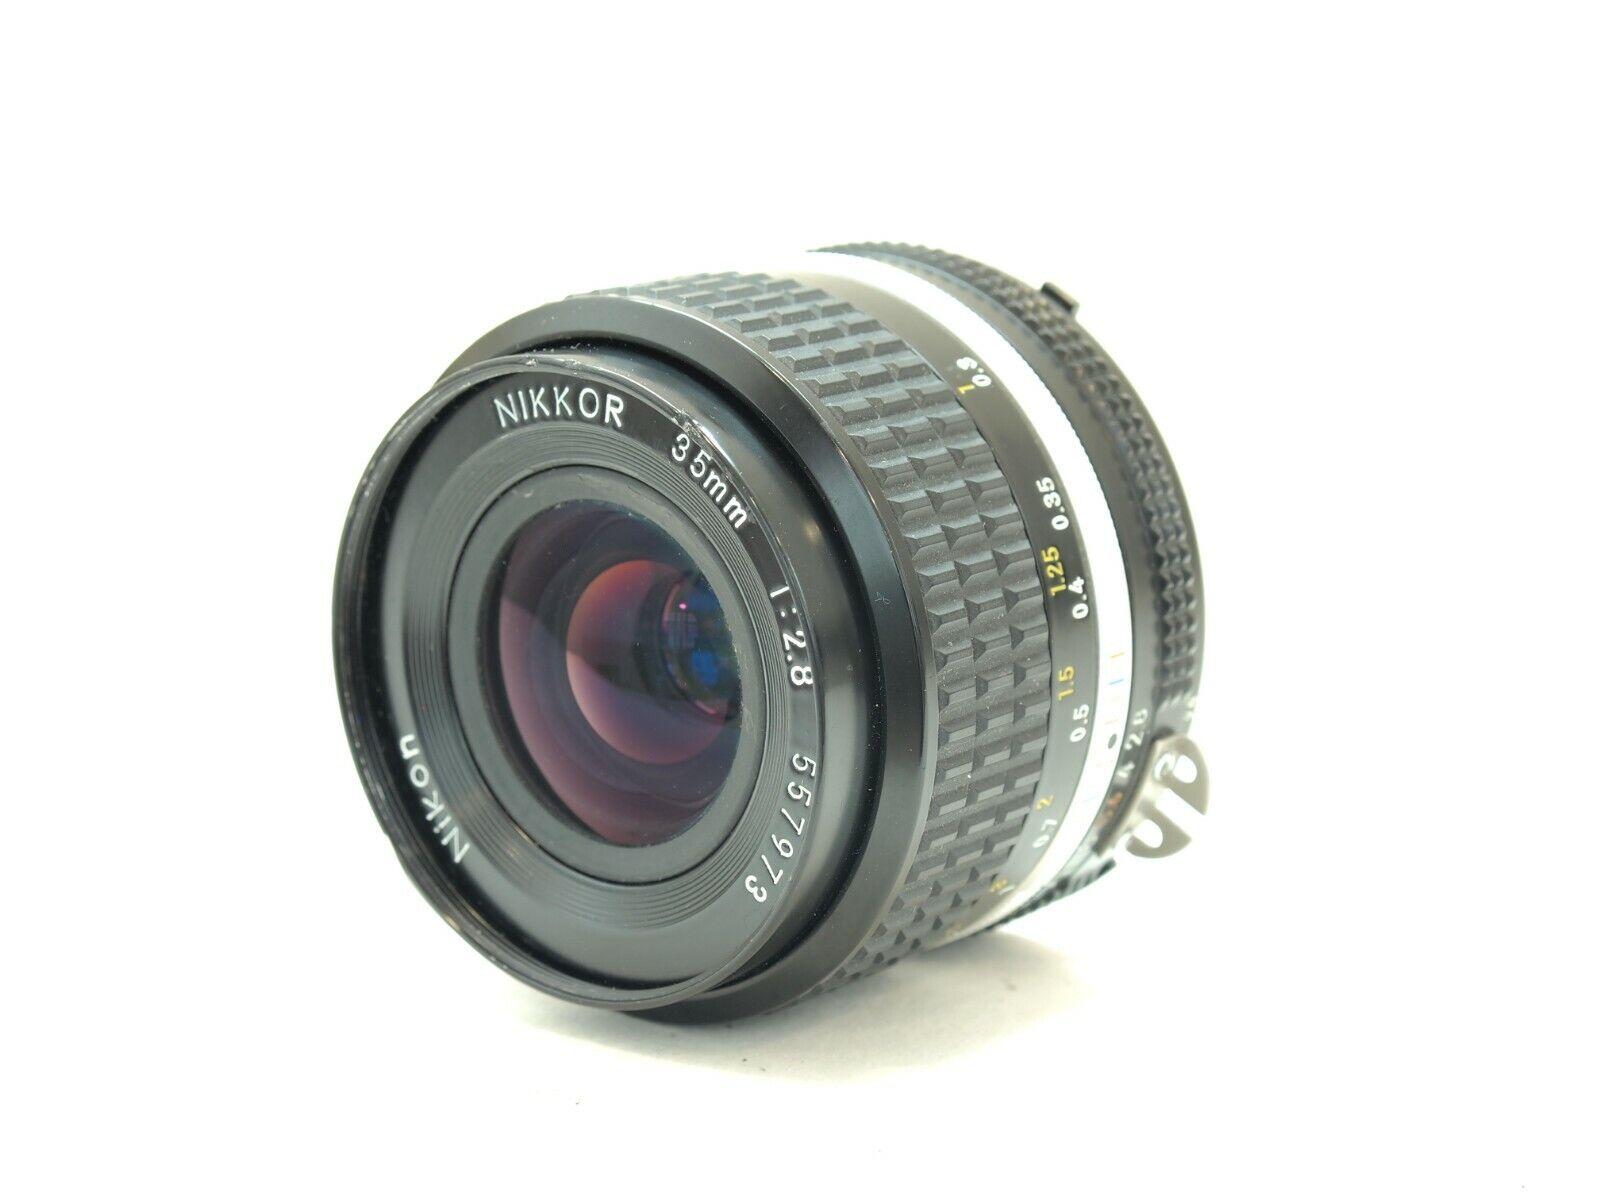 Nikon 35mm F2.8 AI-S Mount Manual Focus Wide Lens. Stock No u13214